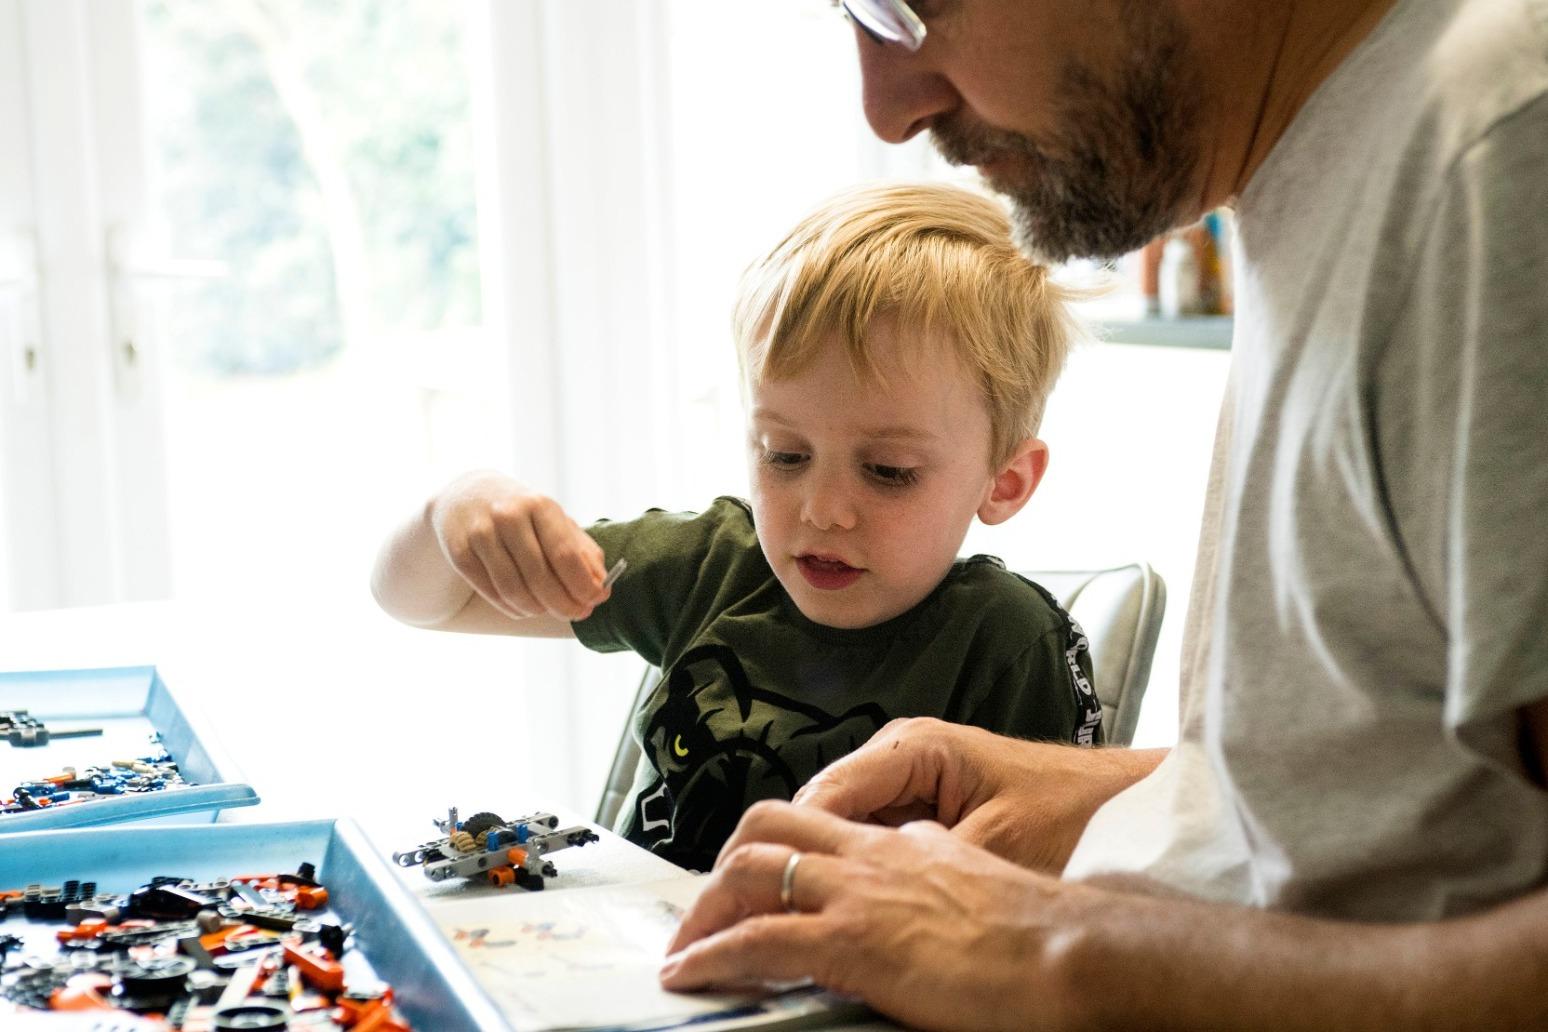 Try Lego or painting during lockdown, says Aardman creative director